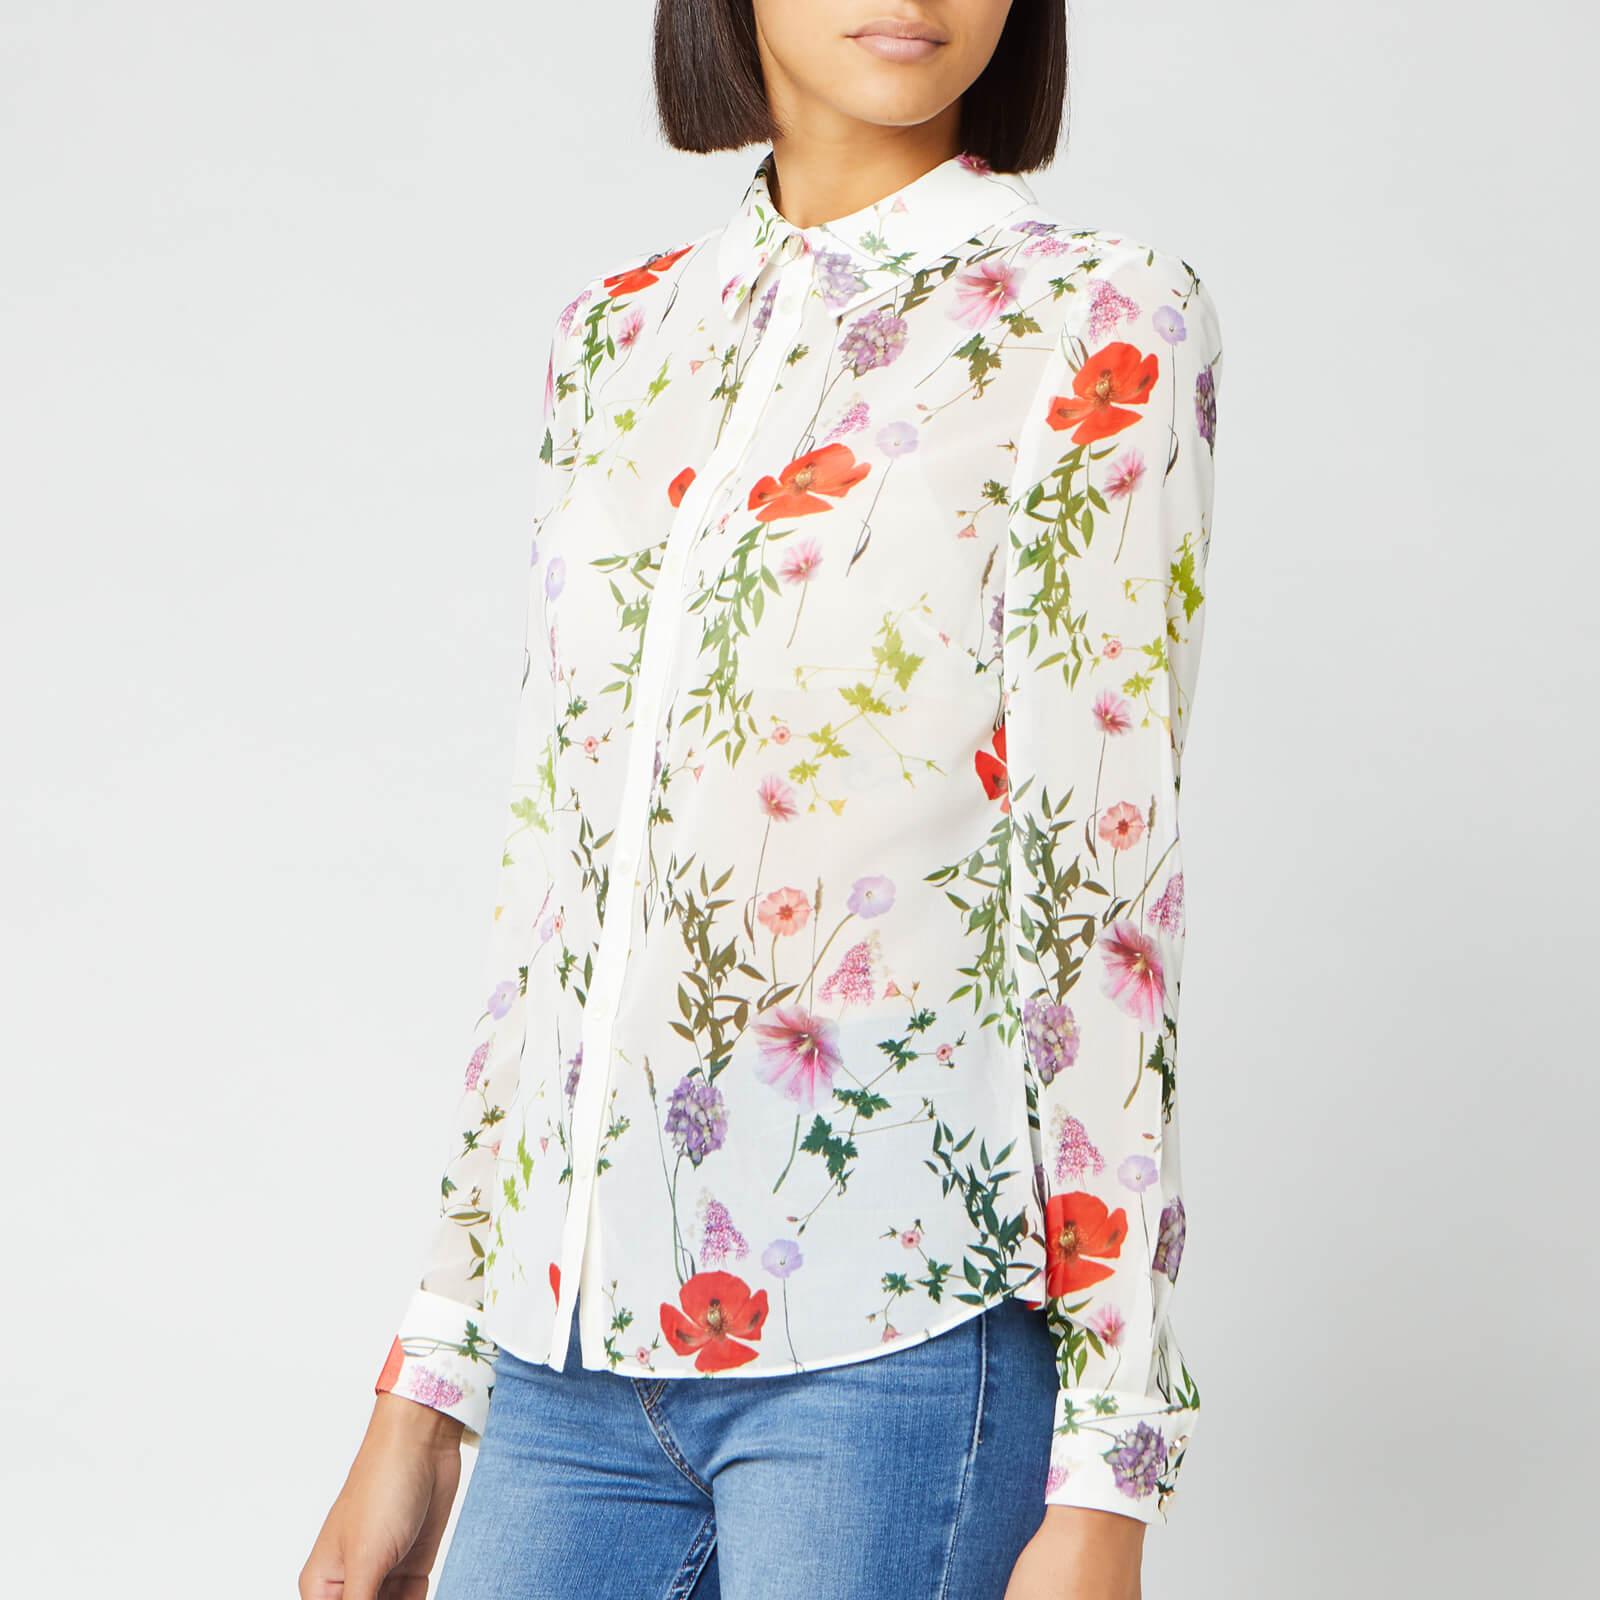 Ted Baker Women's Shivany Hedgerow Printed Shirt - Ivory - 1/UK 8 - Cream